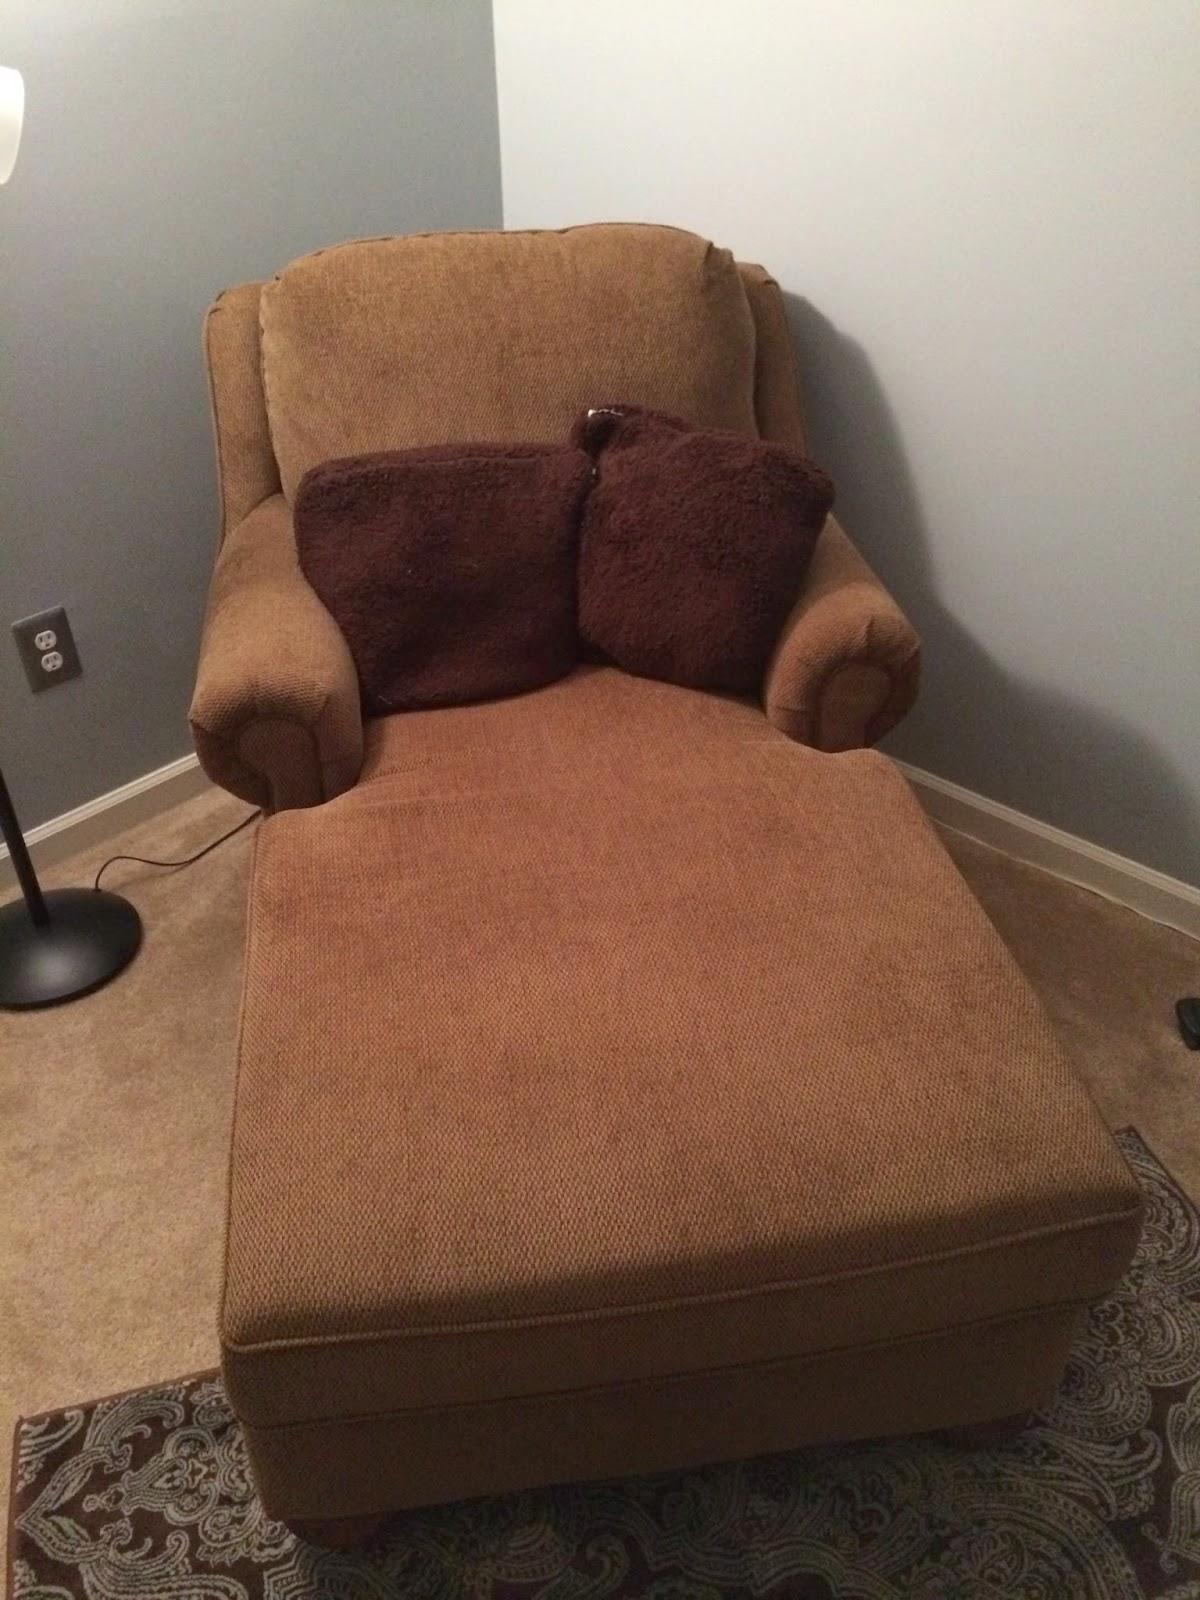 Furniture For Sale in Woodbridge VA